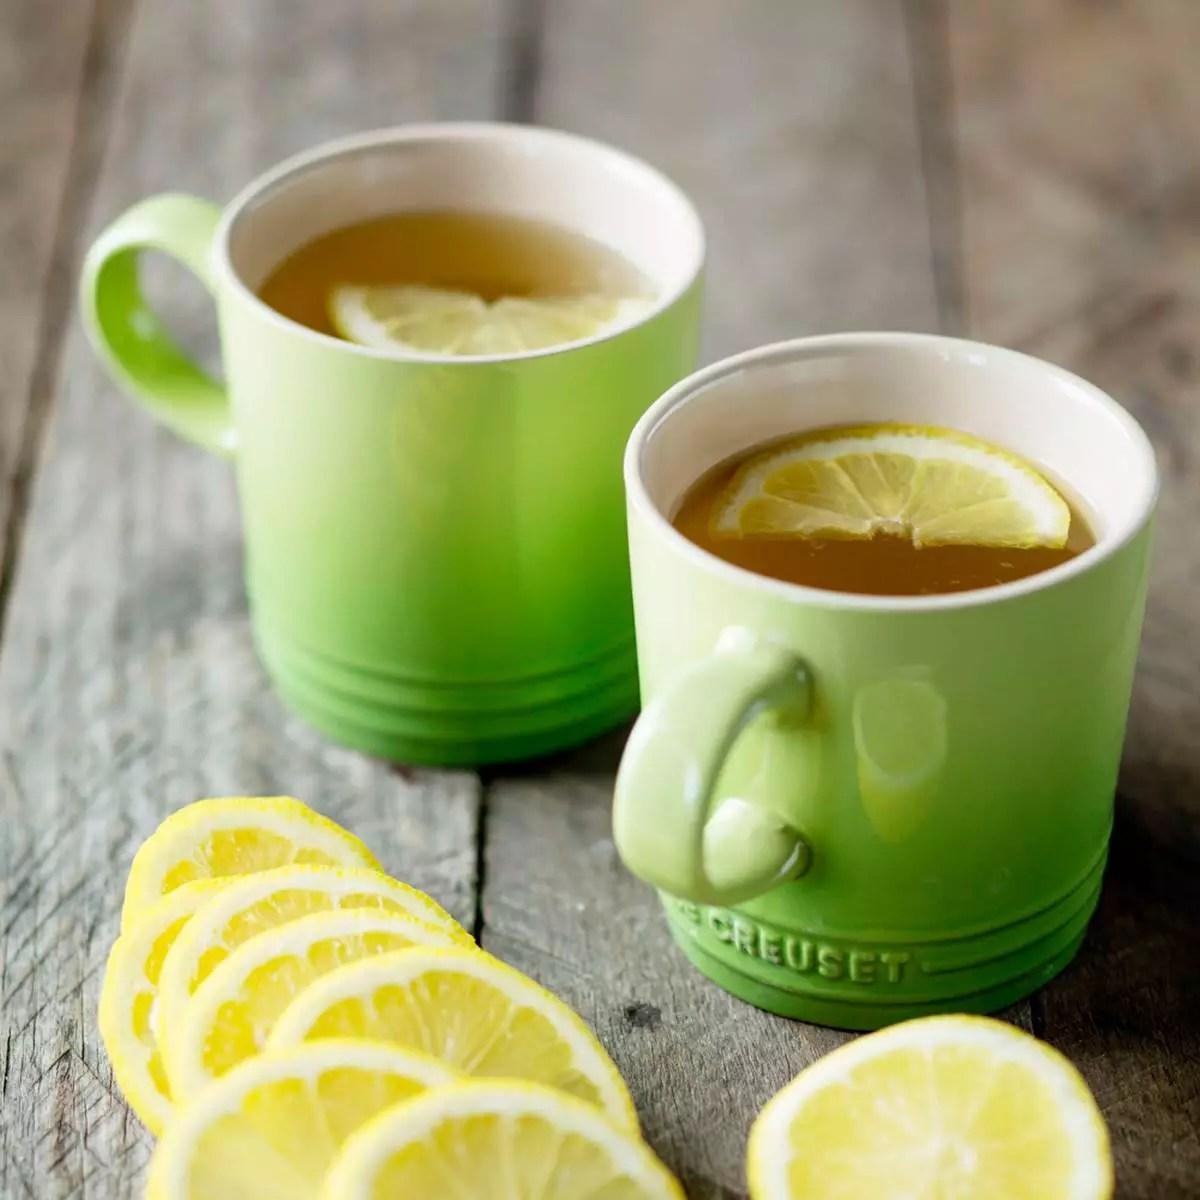 Kleur & Interieur | Go green! Pantone kleur 2017 = Greenery - Woonblog StijlvolStyling.com